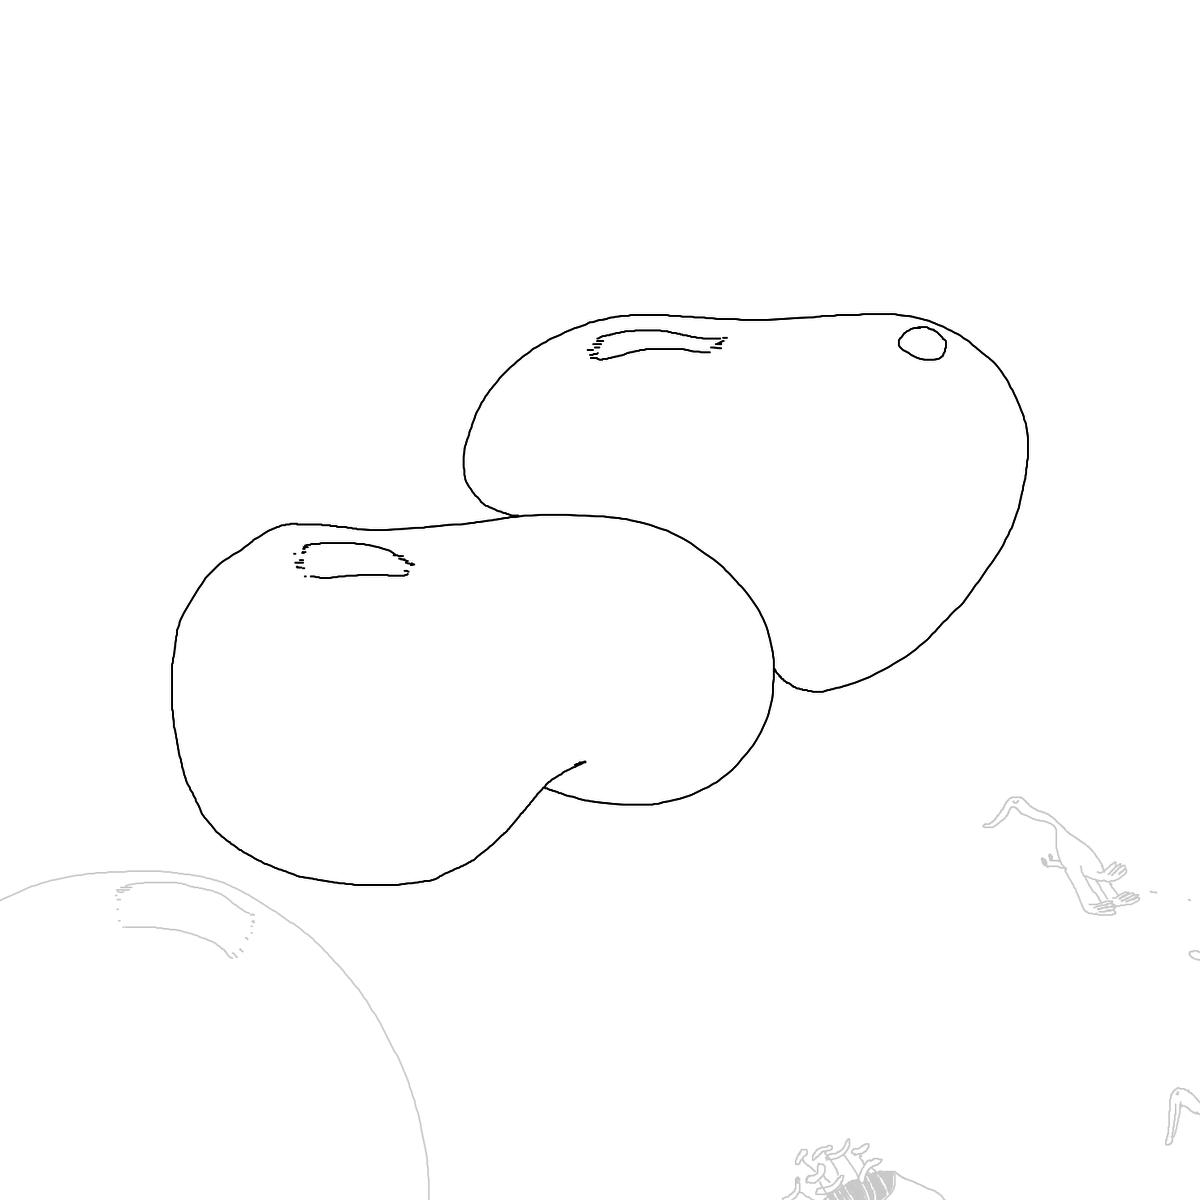 BAAAM drawing#3767 lat:78.4207763671875000lng: -4.4887809753417970